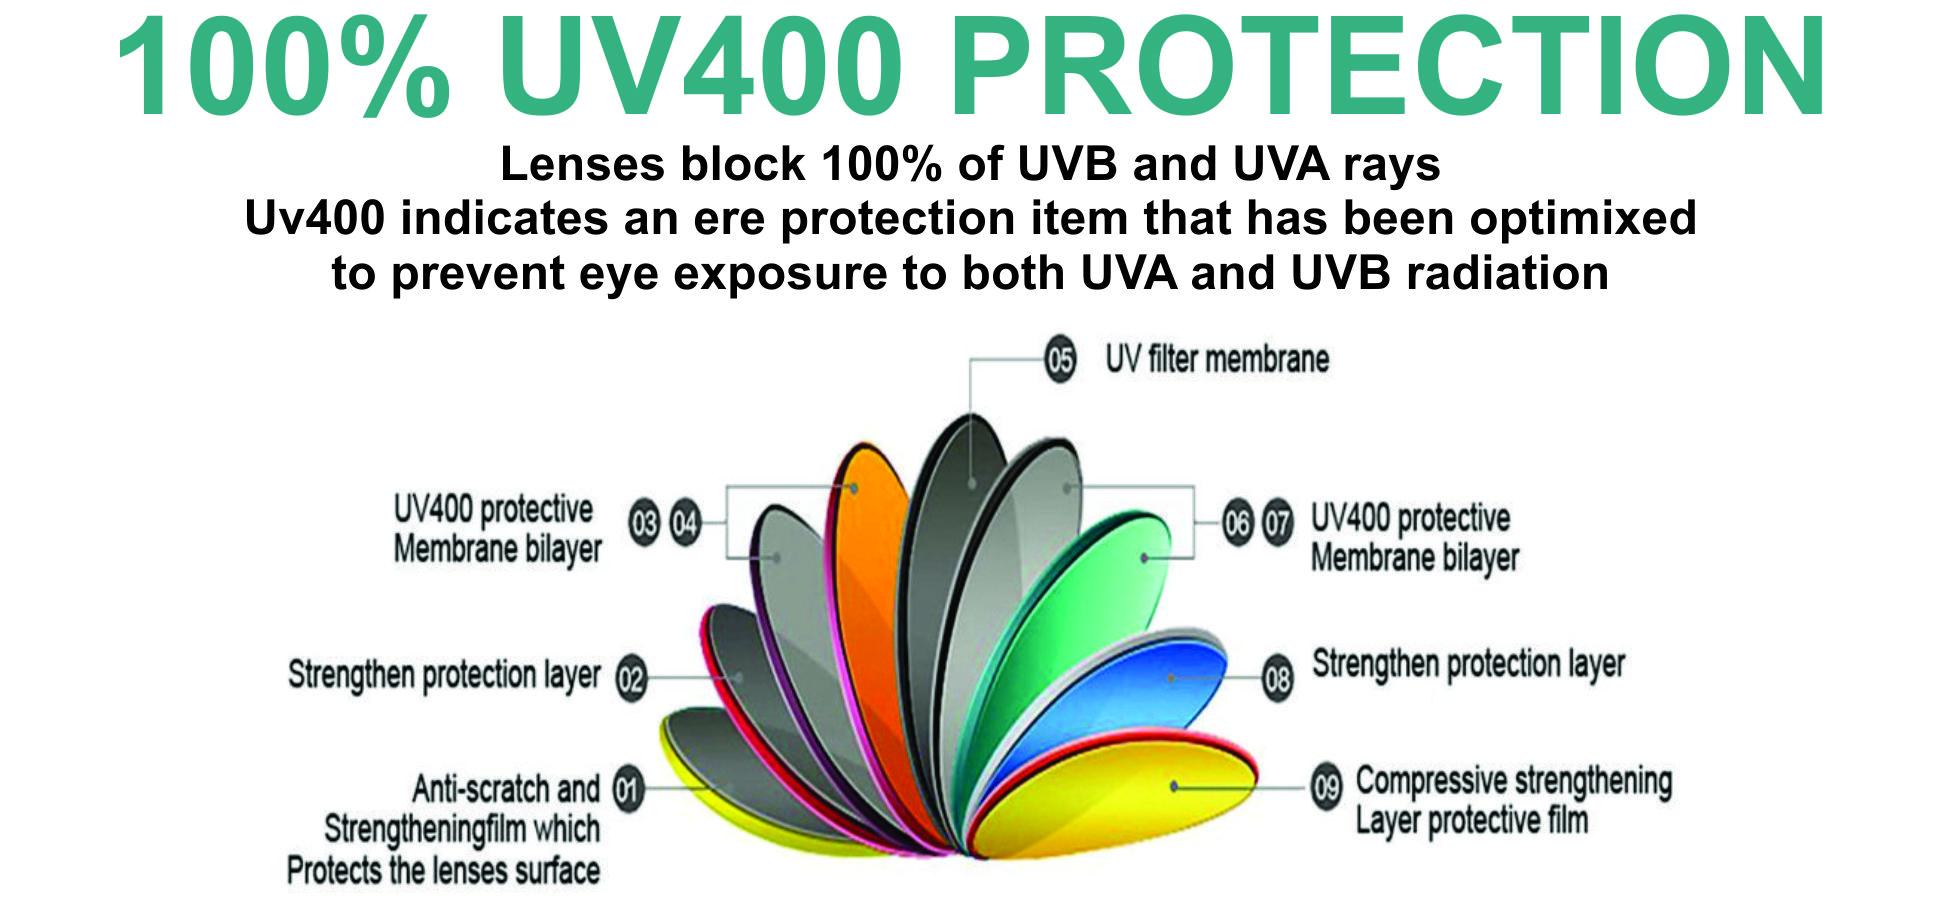 ROZIOR RWP5003C1 UV400 Protection